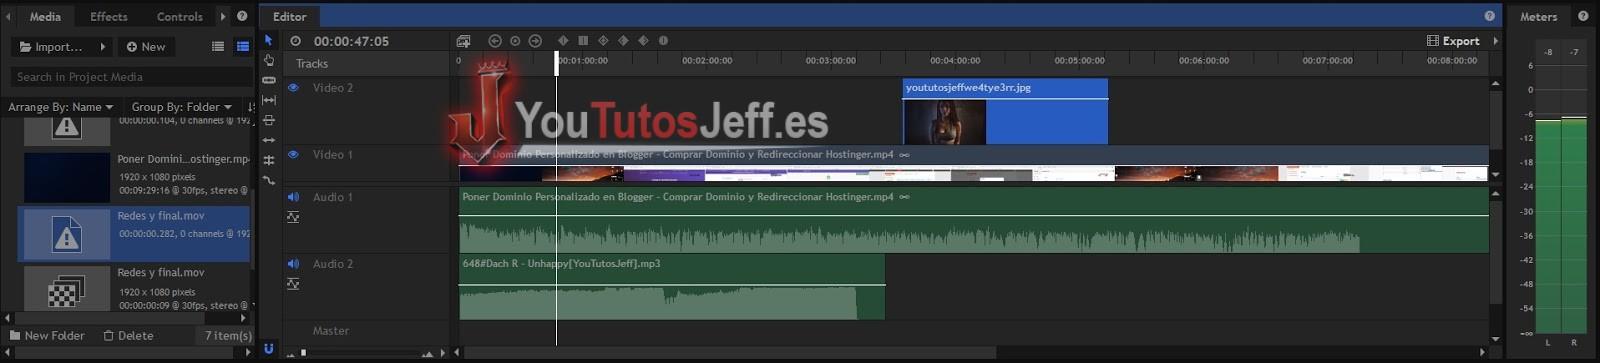 editor de video gratis para pc